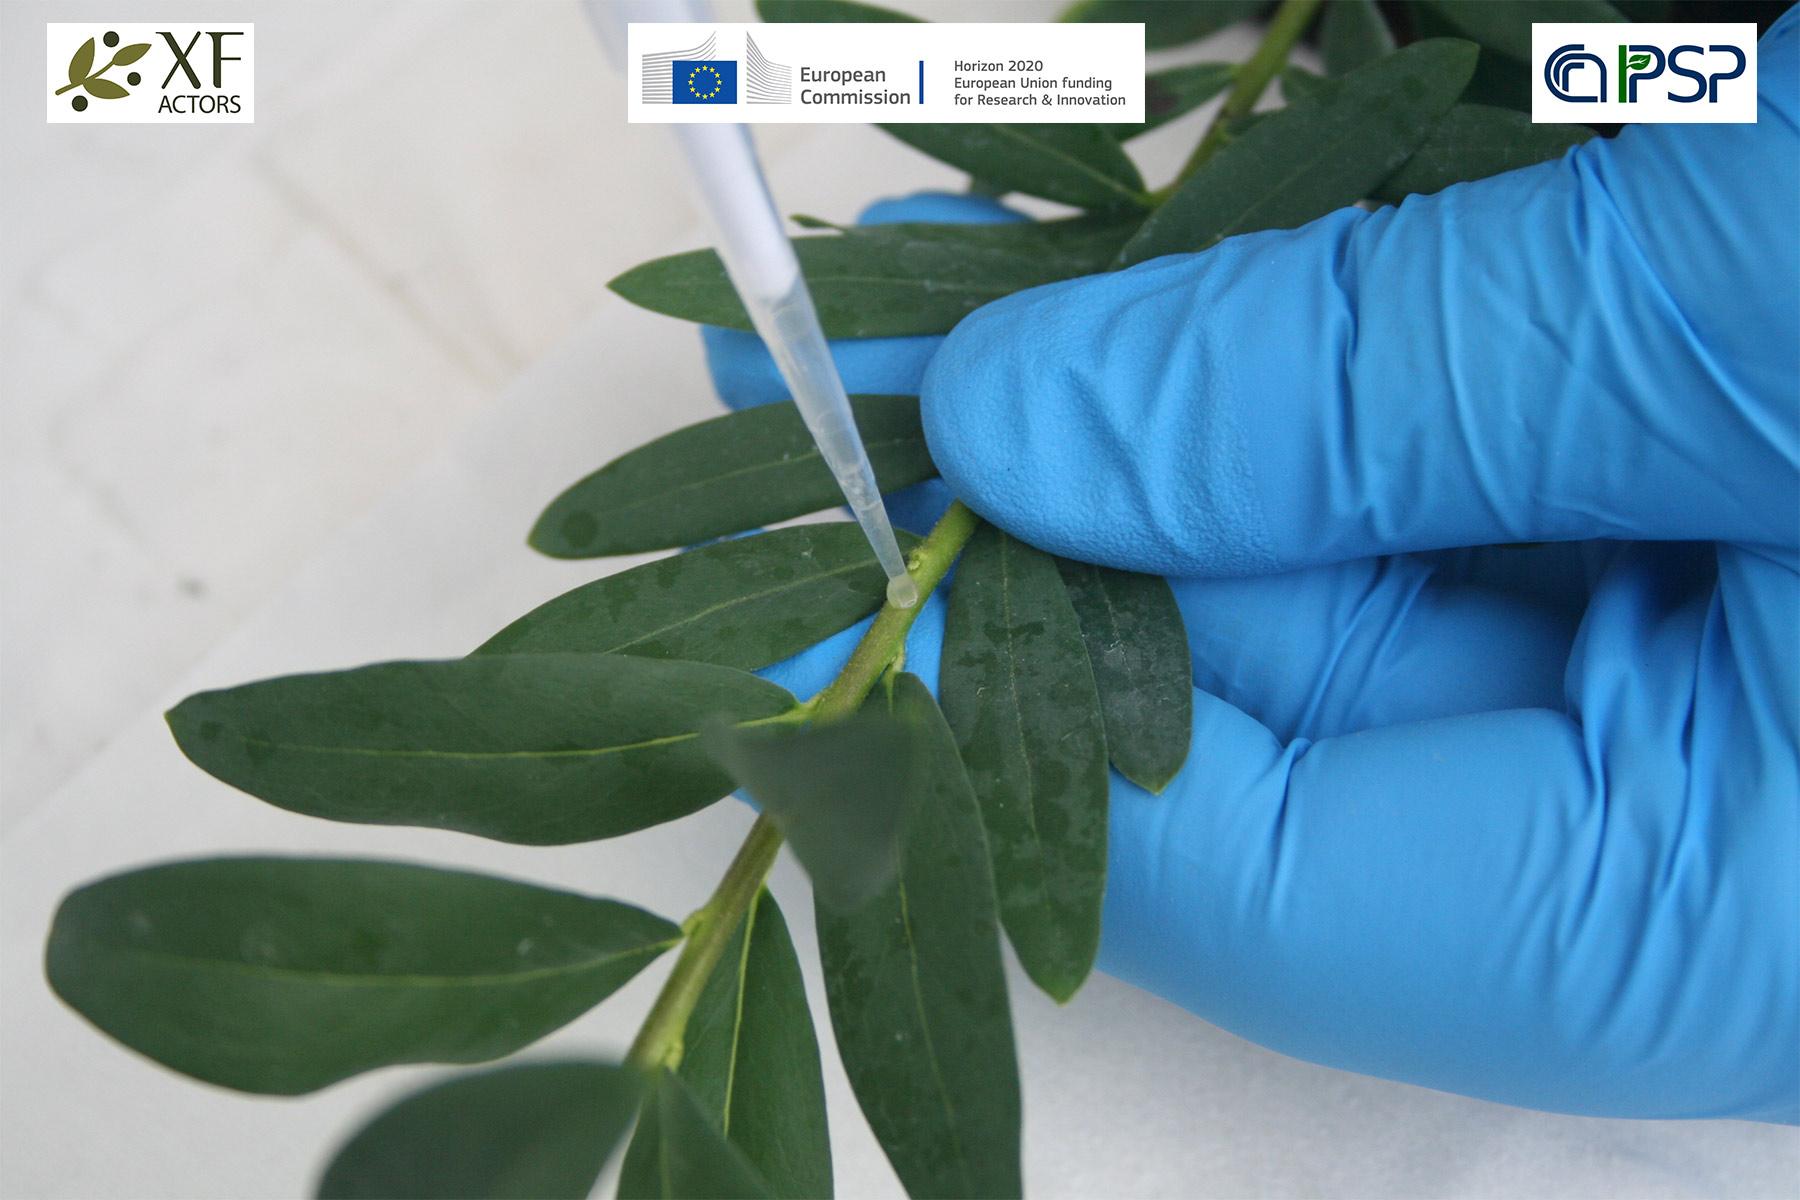 15 - inoculation Xf in Polygala myrtifolia